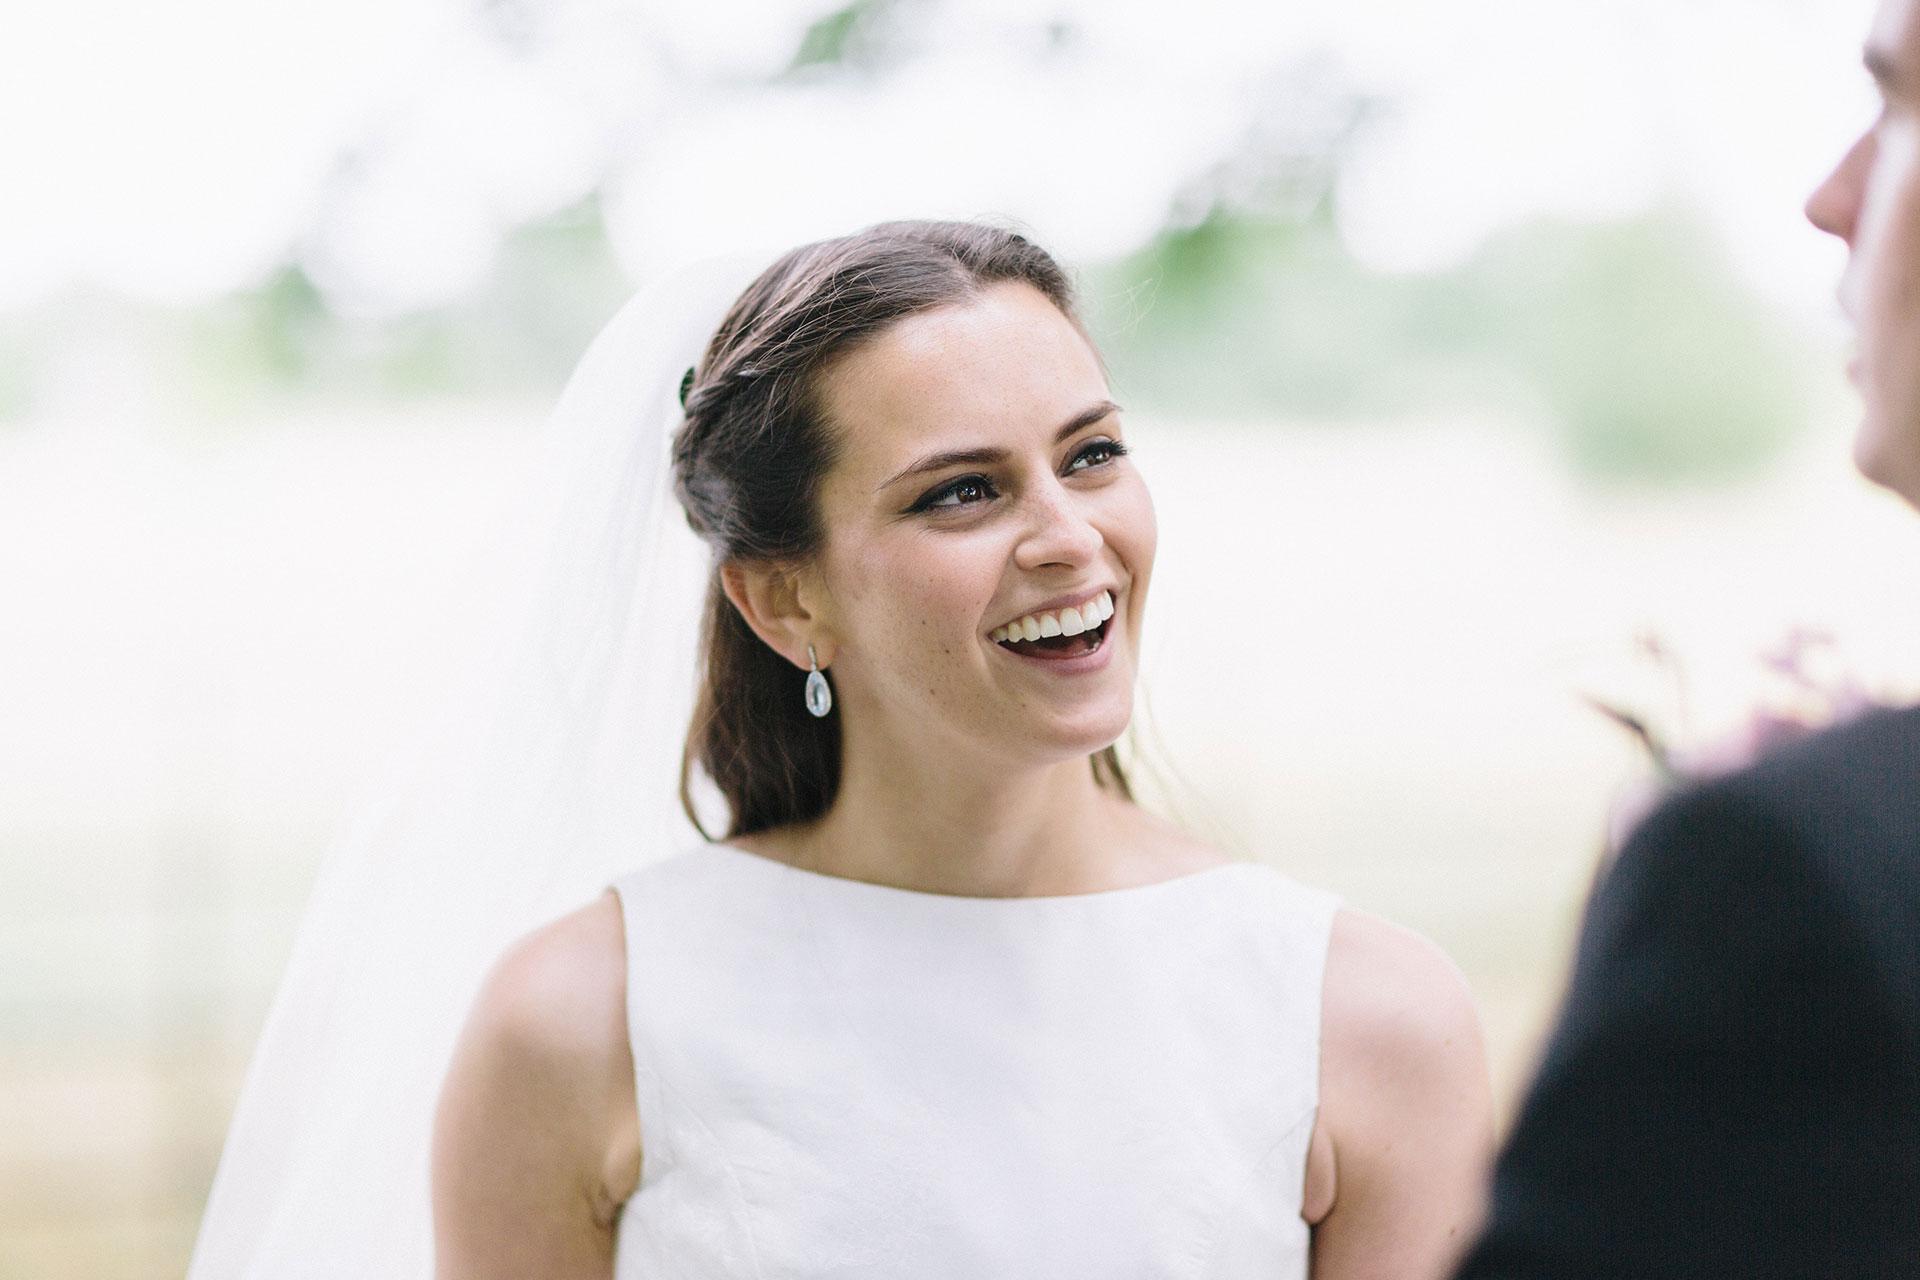 Langar-Hall-wedding-photographer-in-Nottinghamshire-Michael-Newington-Gray-63.jpg